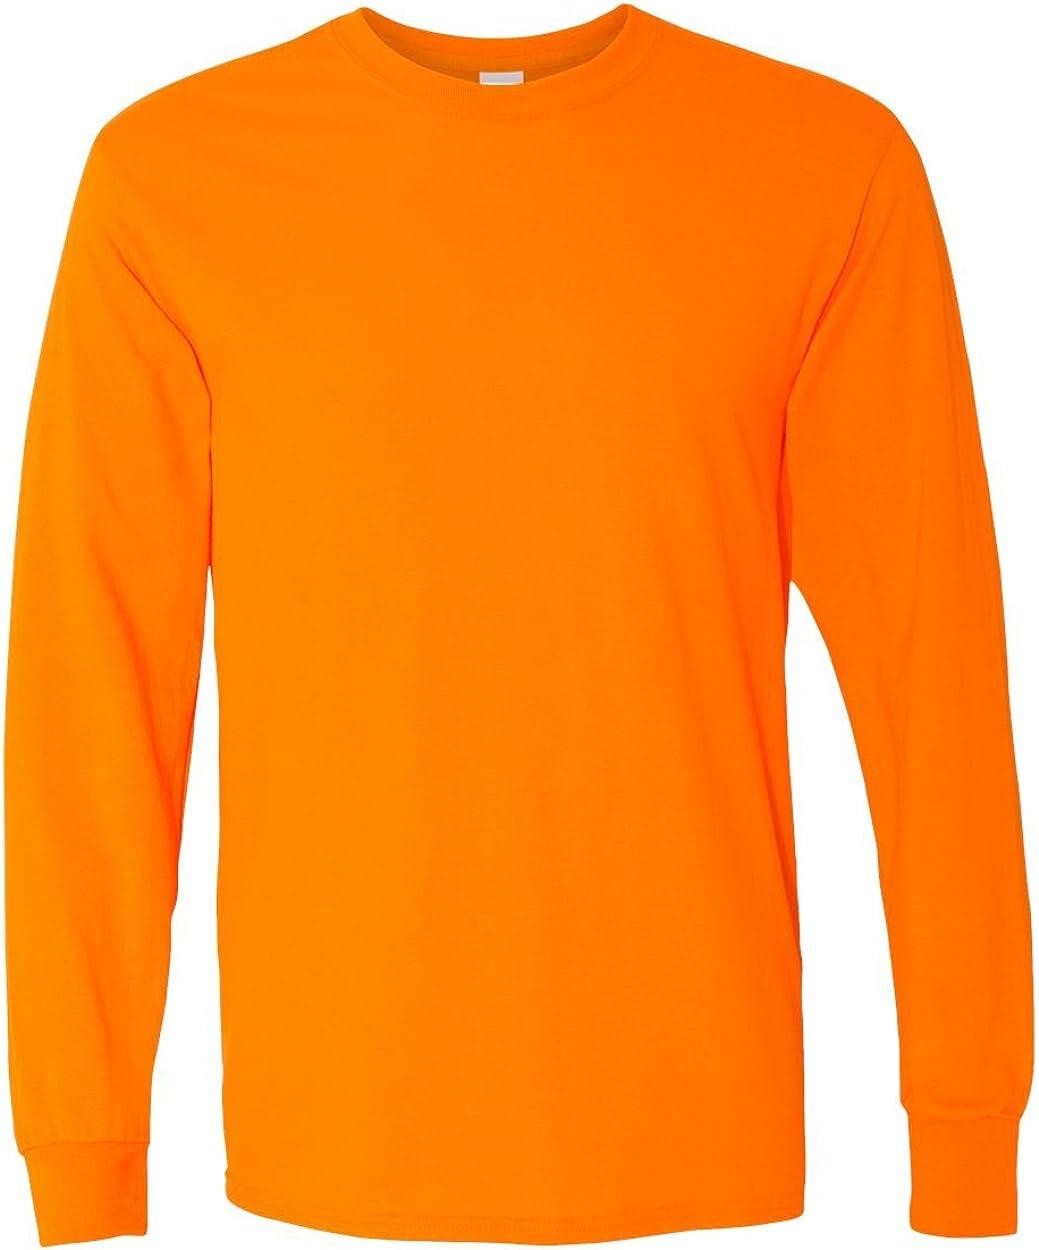 Gildan Heavy Cotton 100% Cotton Long Sleeve T-Shirt.